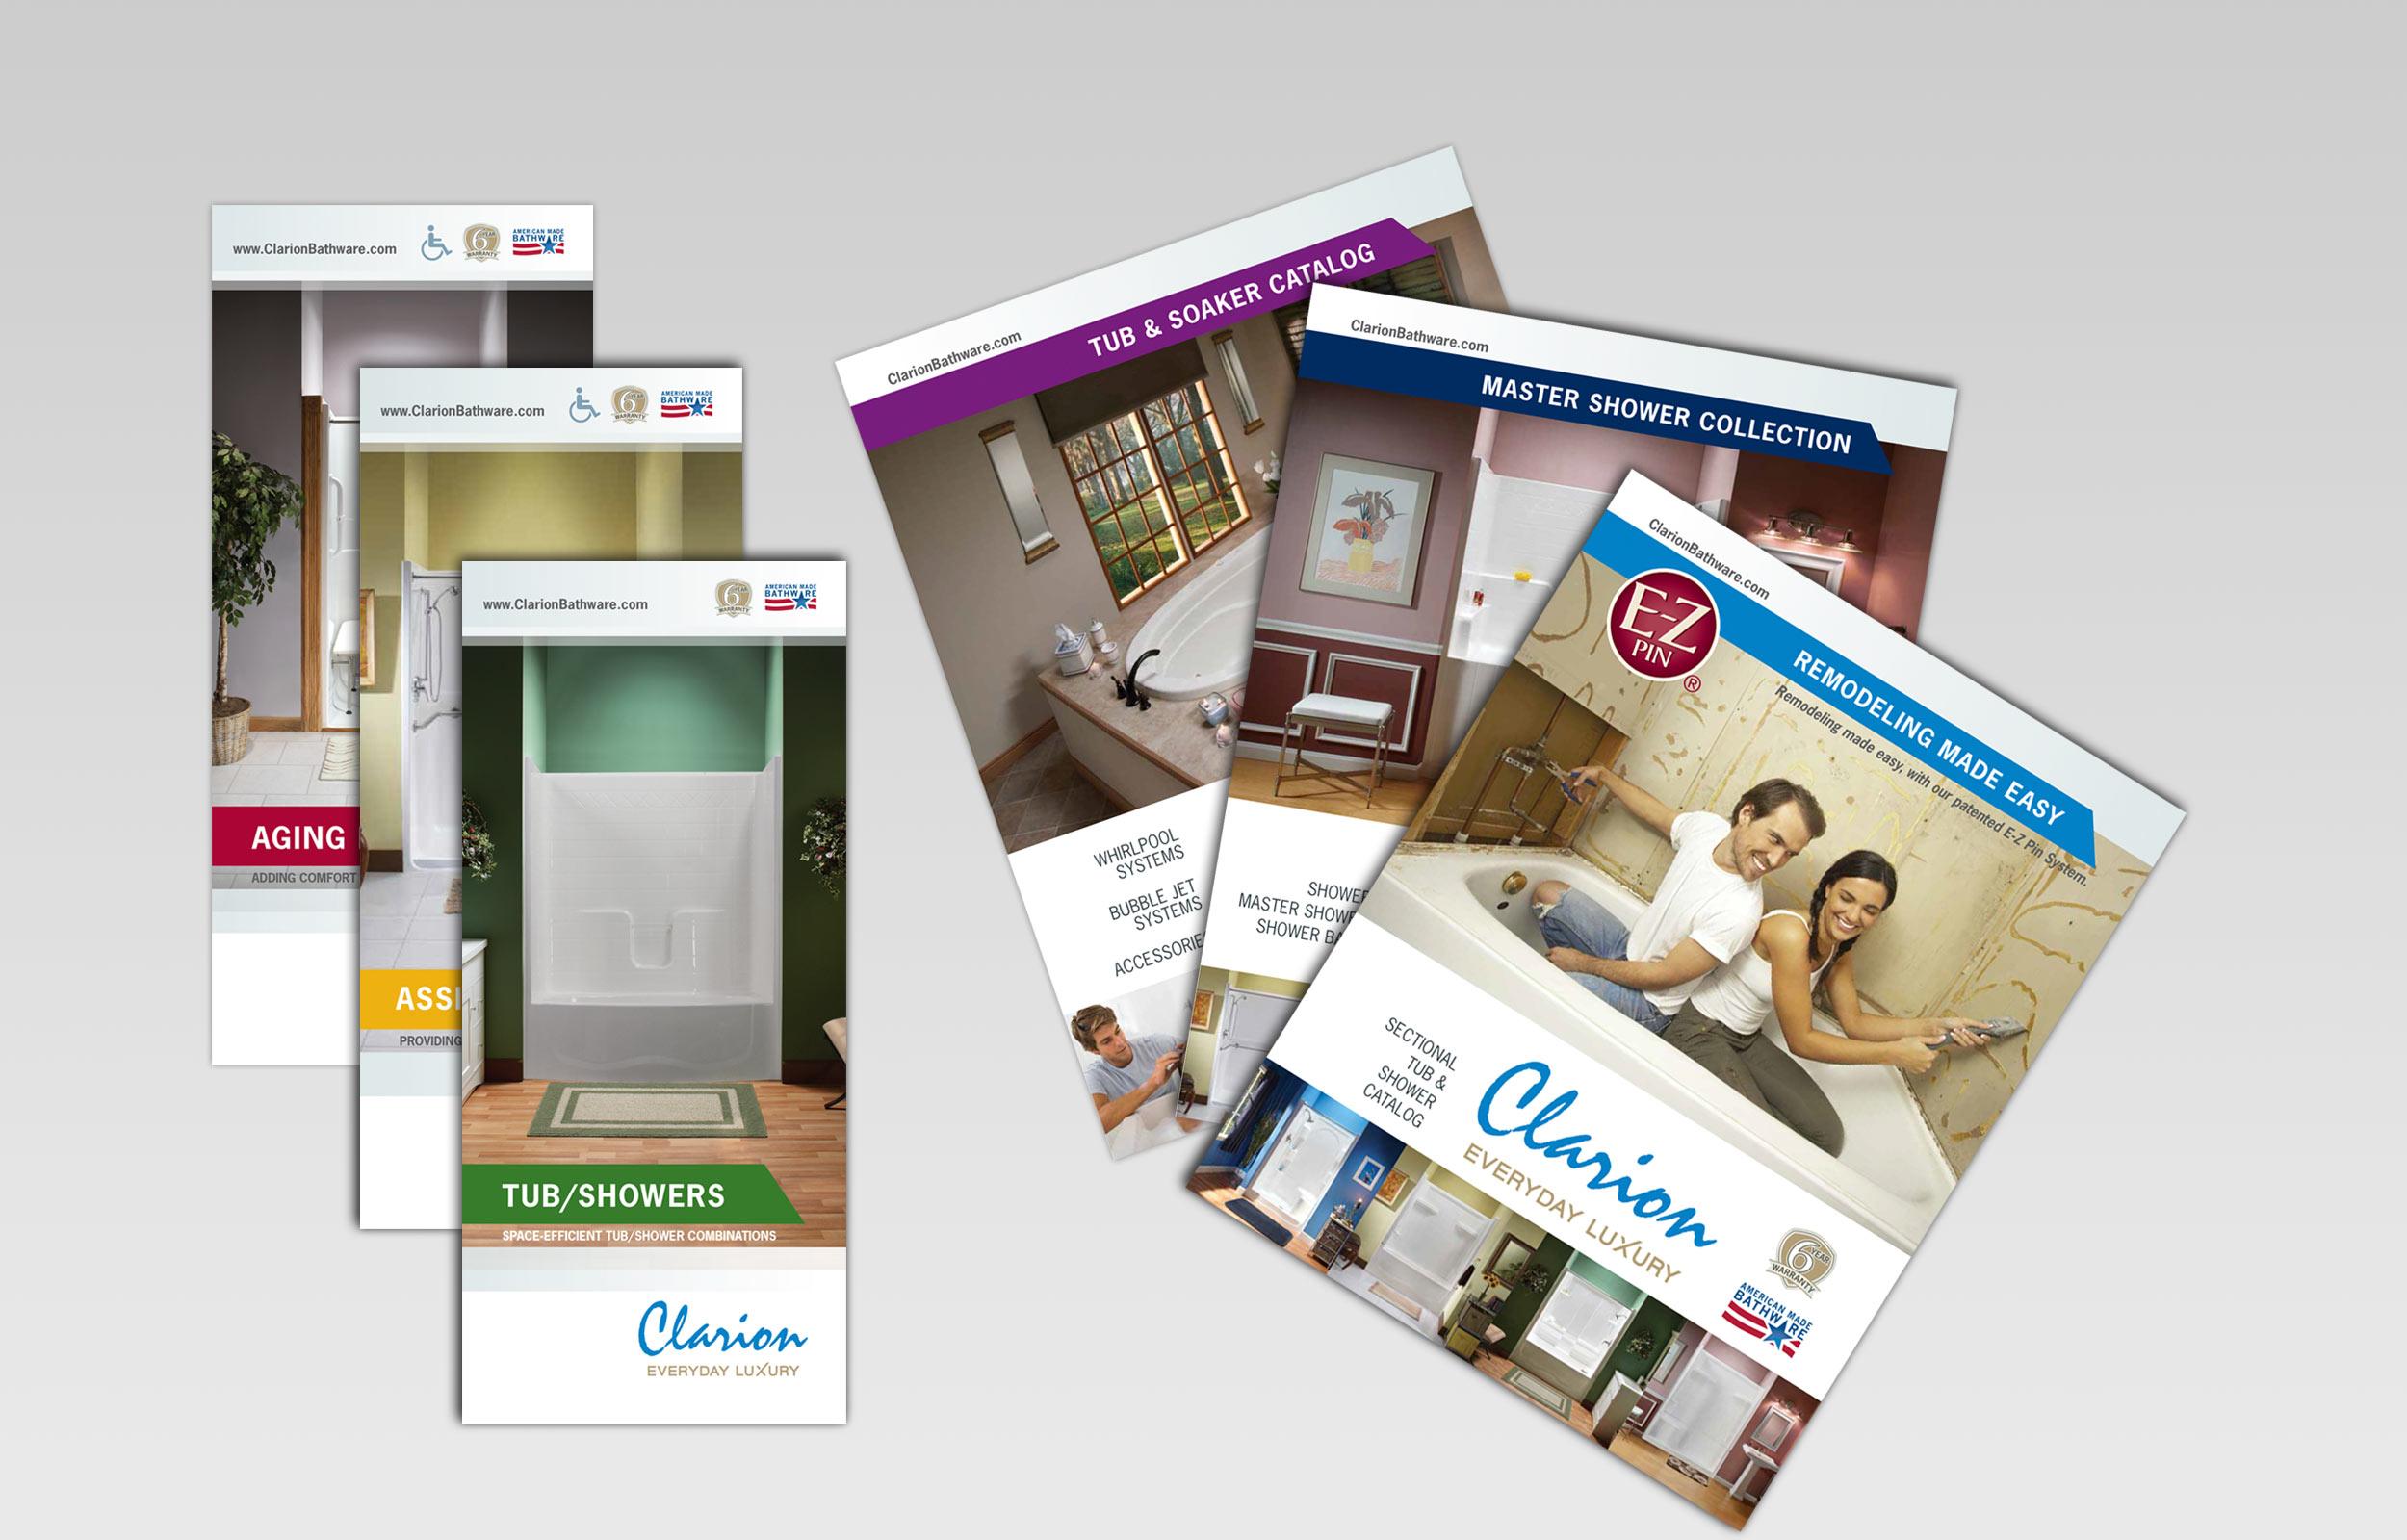 http://papaadvertising.com/wp-content/uploads/2015/10/CBW-Brochure.jpg